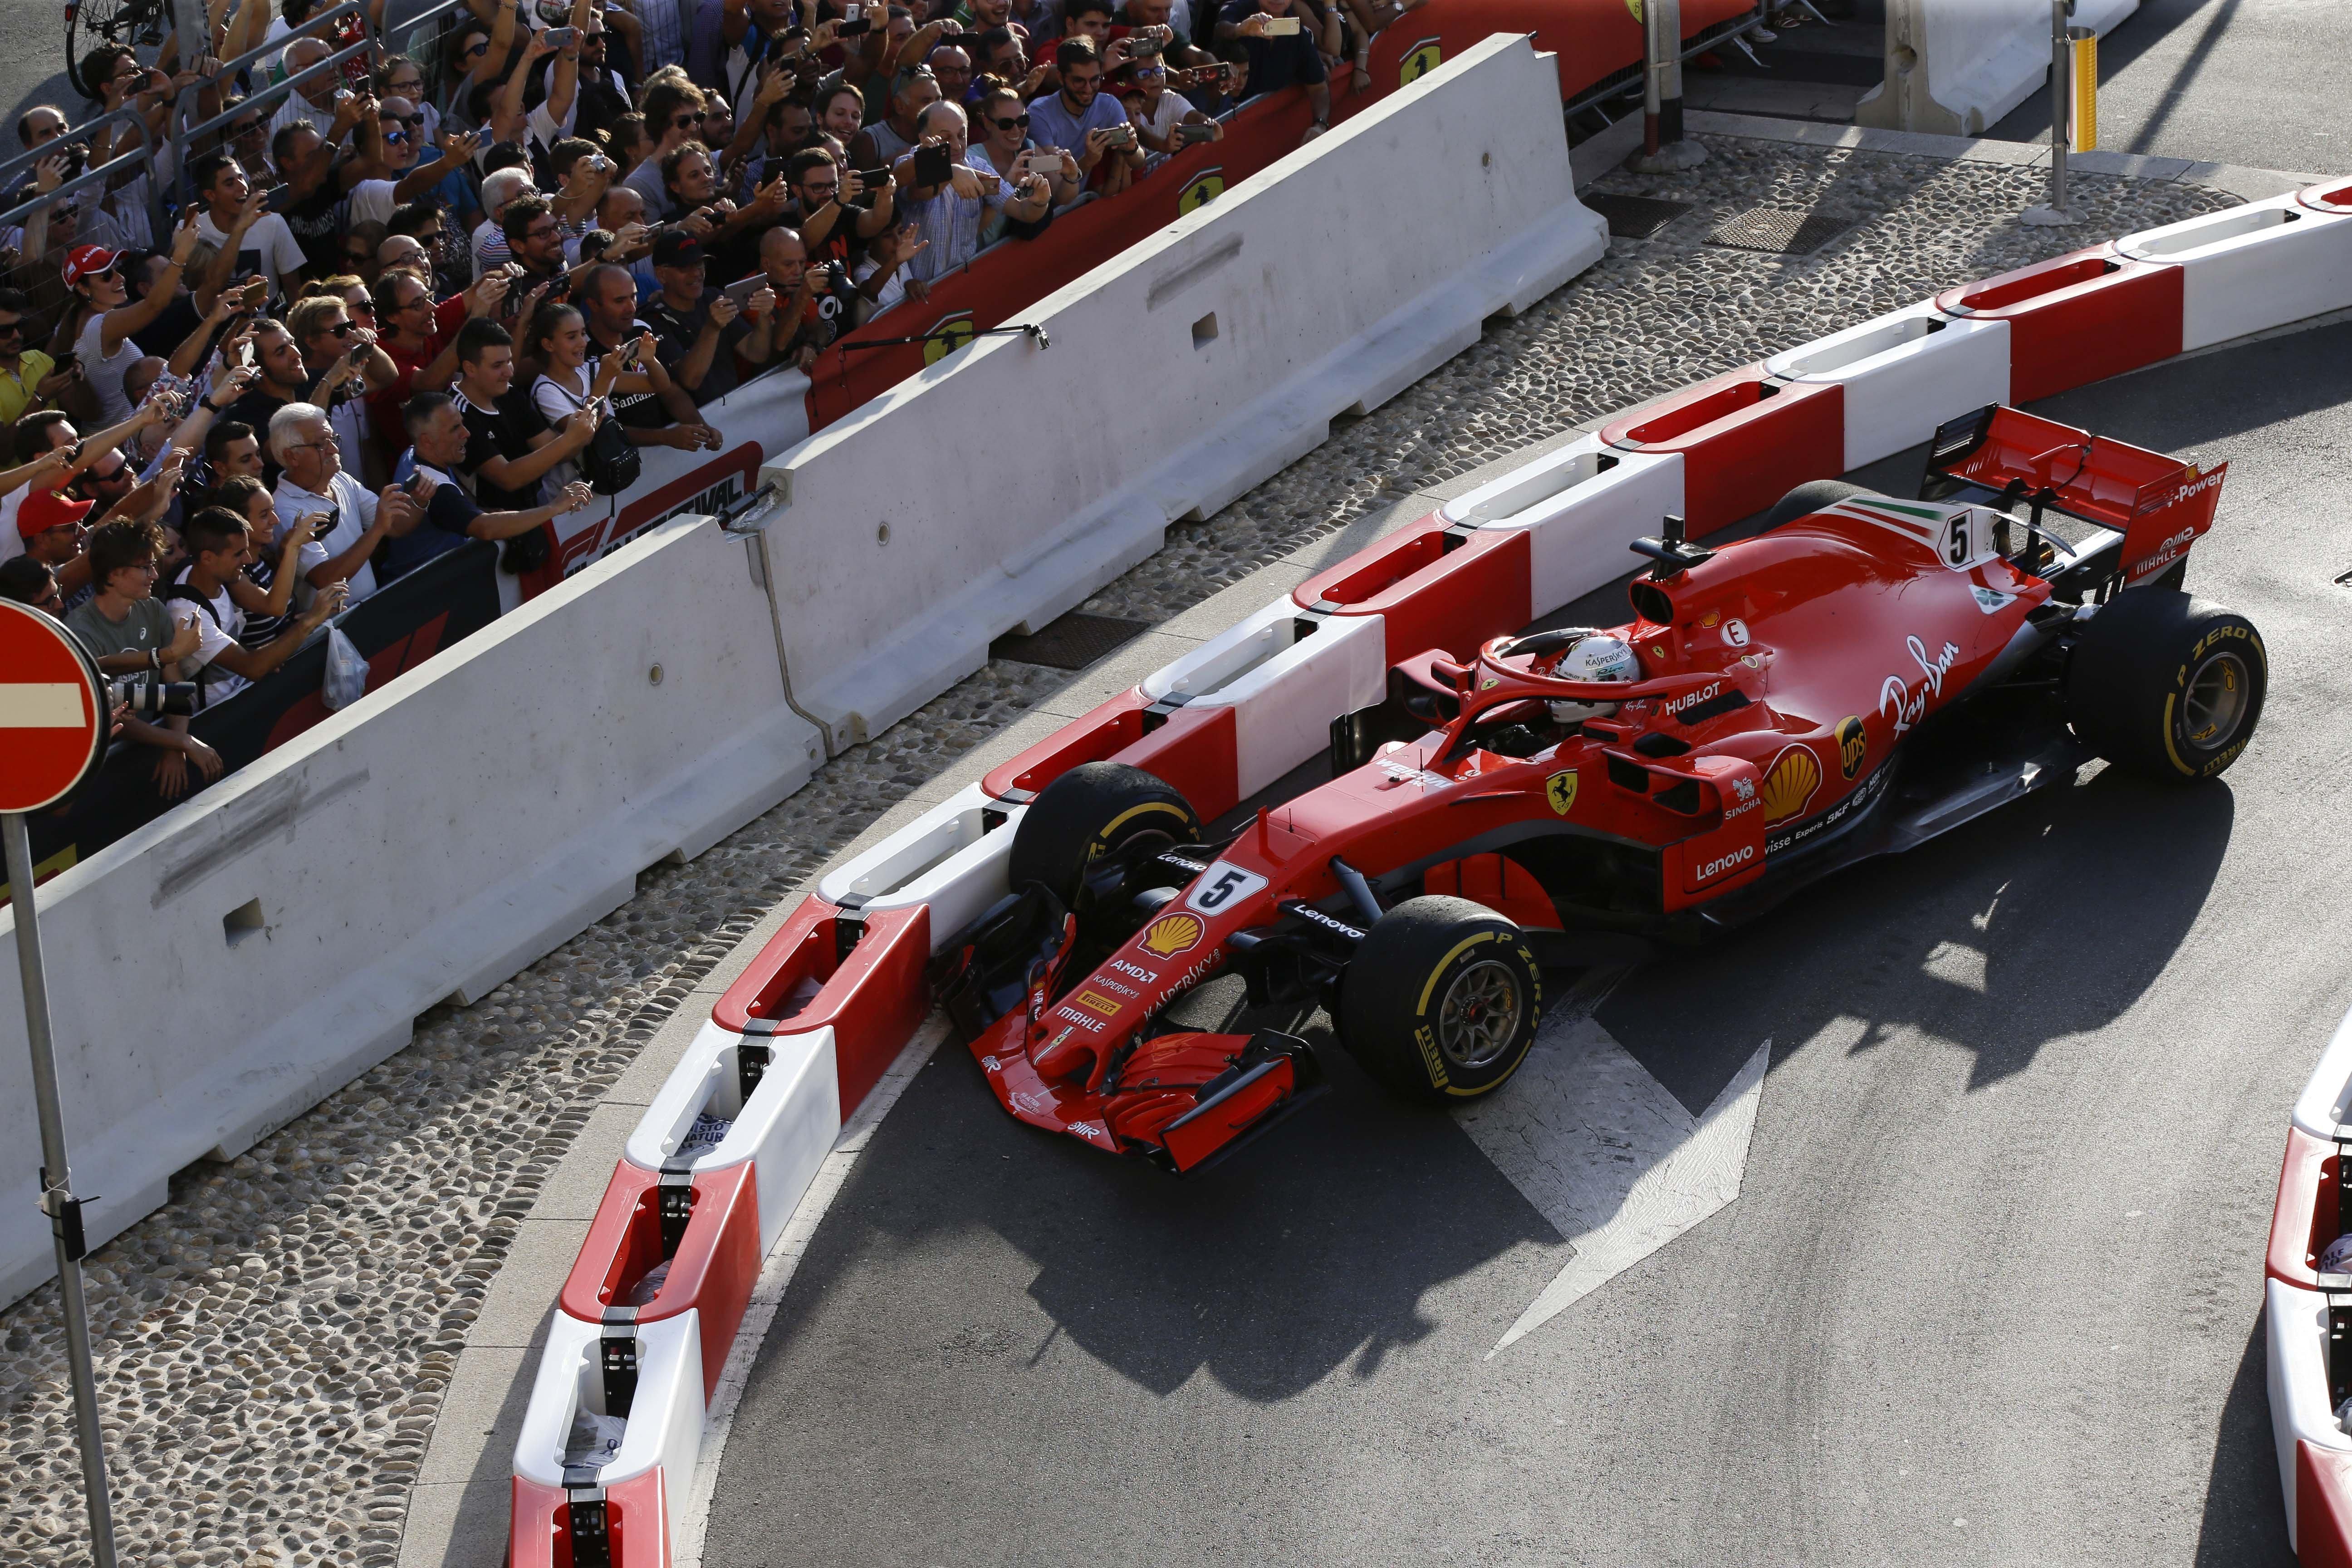 Sebastian Vettel suffered the embarrassment of crashing his Ferrari into the barrier